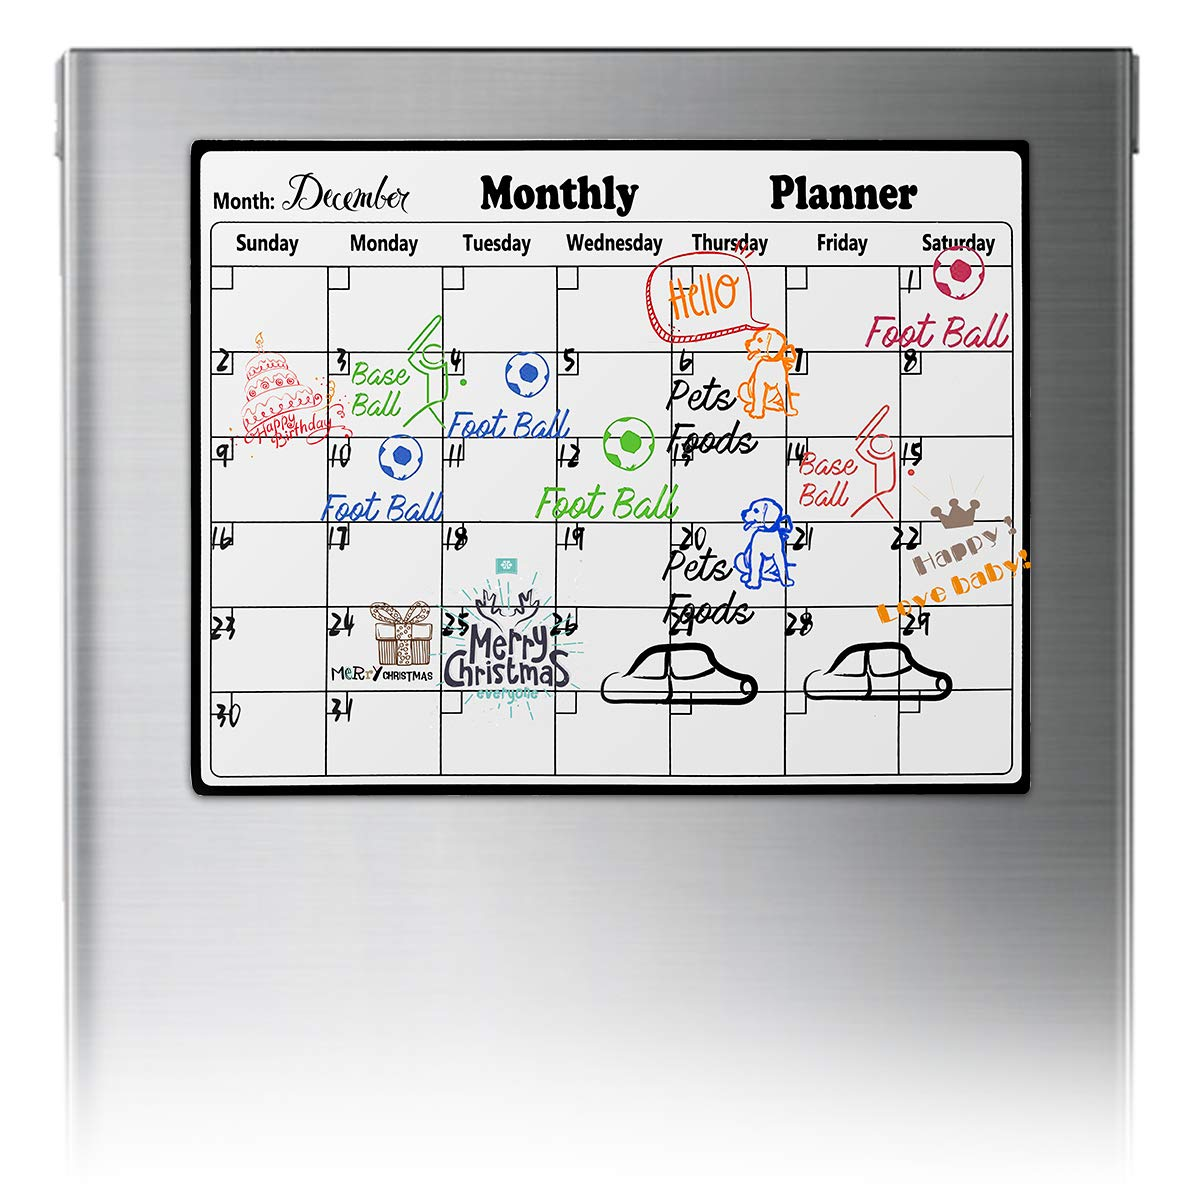 Dry Erase Calendar Fridge Magnetic Calendar Large White Board Planner Monthly Weekly Erasable Calendar for Kitchen Refrigerator